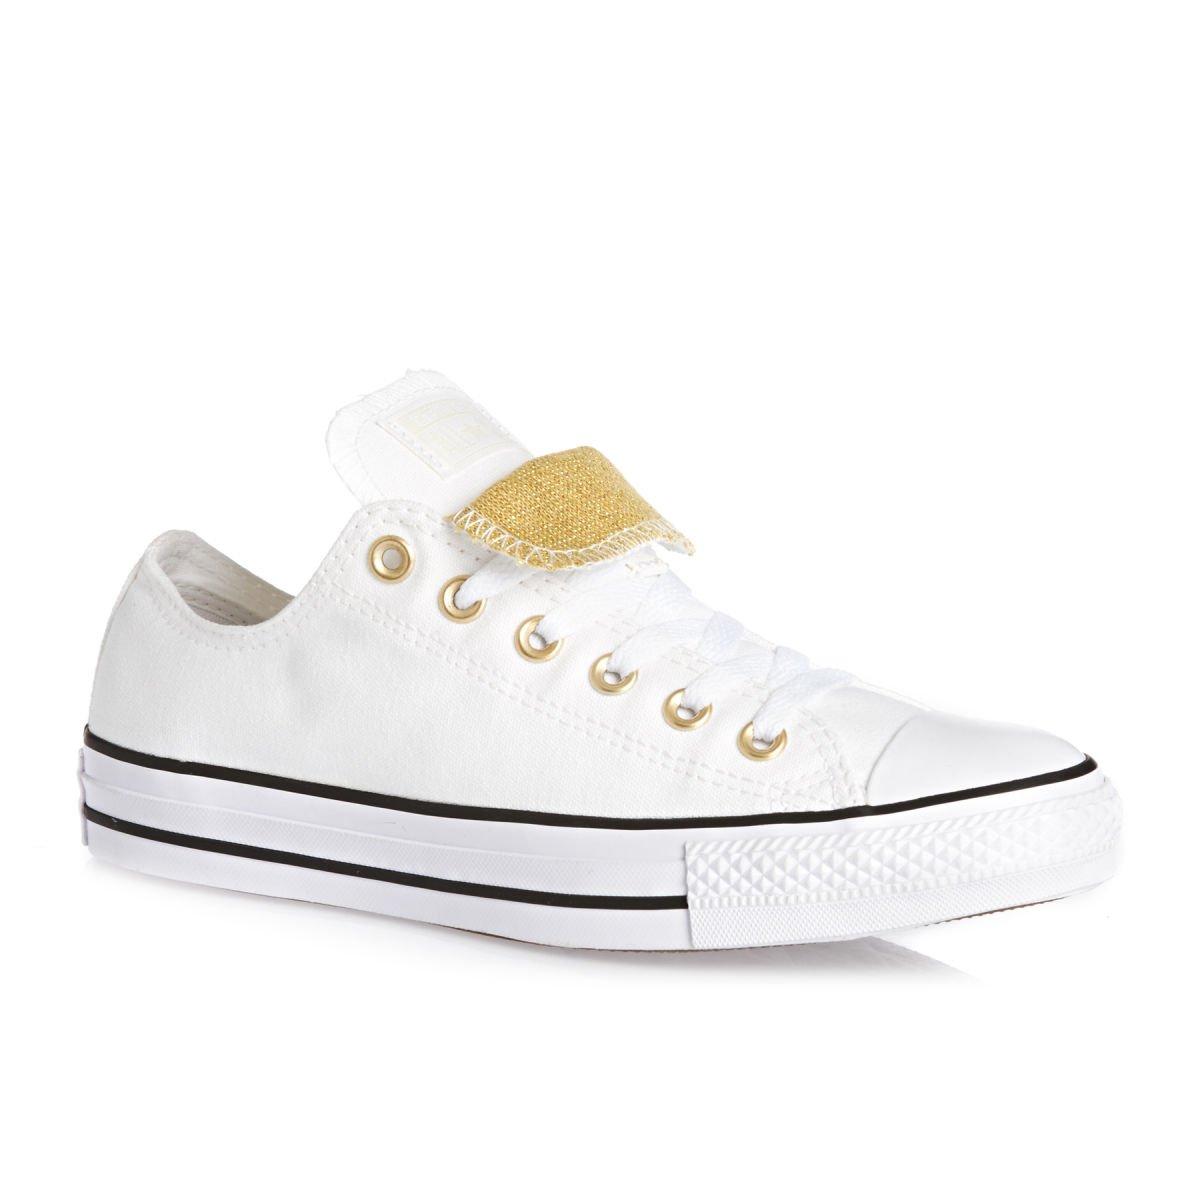 gold converse, Converse youth chuck taylor allstar double